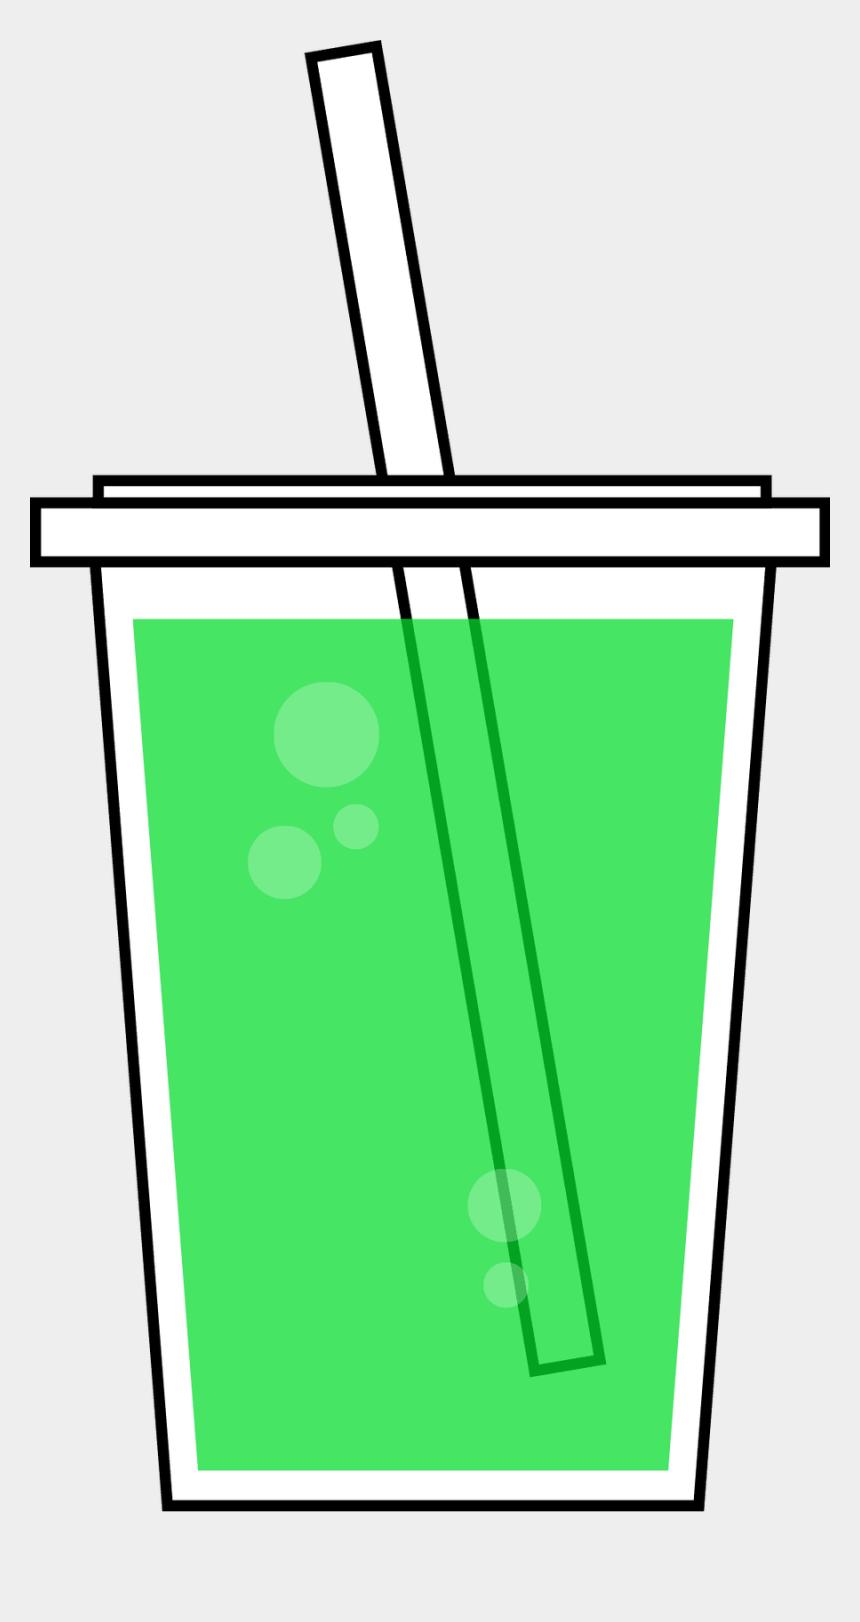 soda clipart, Cartoons - Red Drink Clip Art - Green Juice Clipart